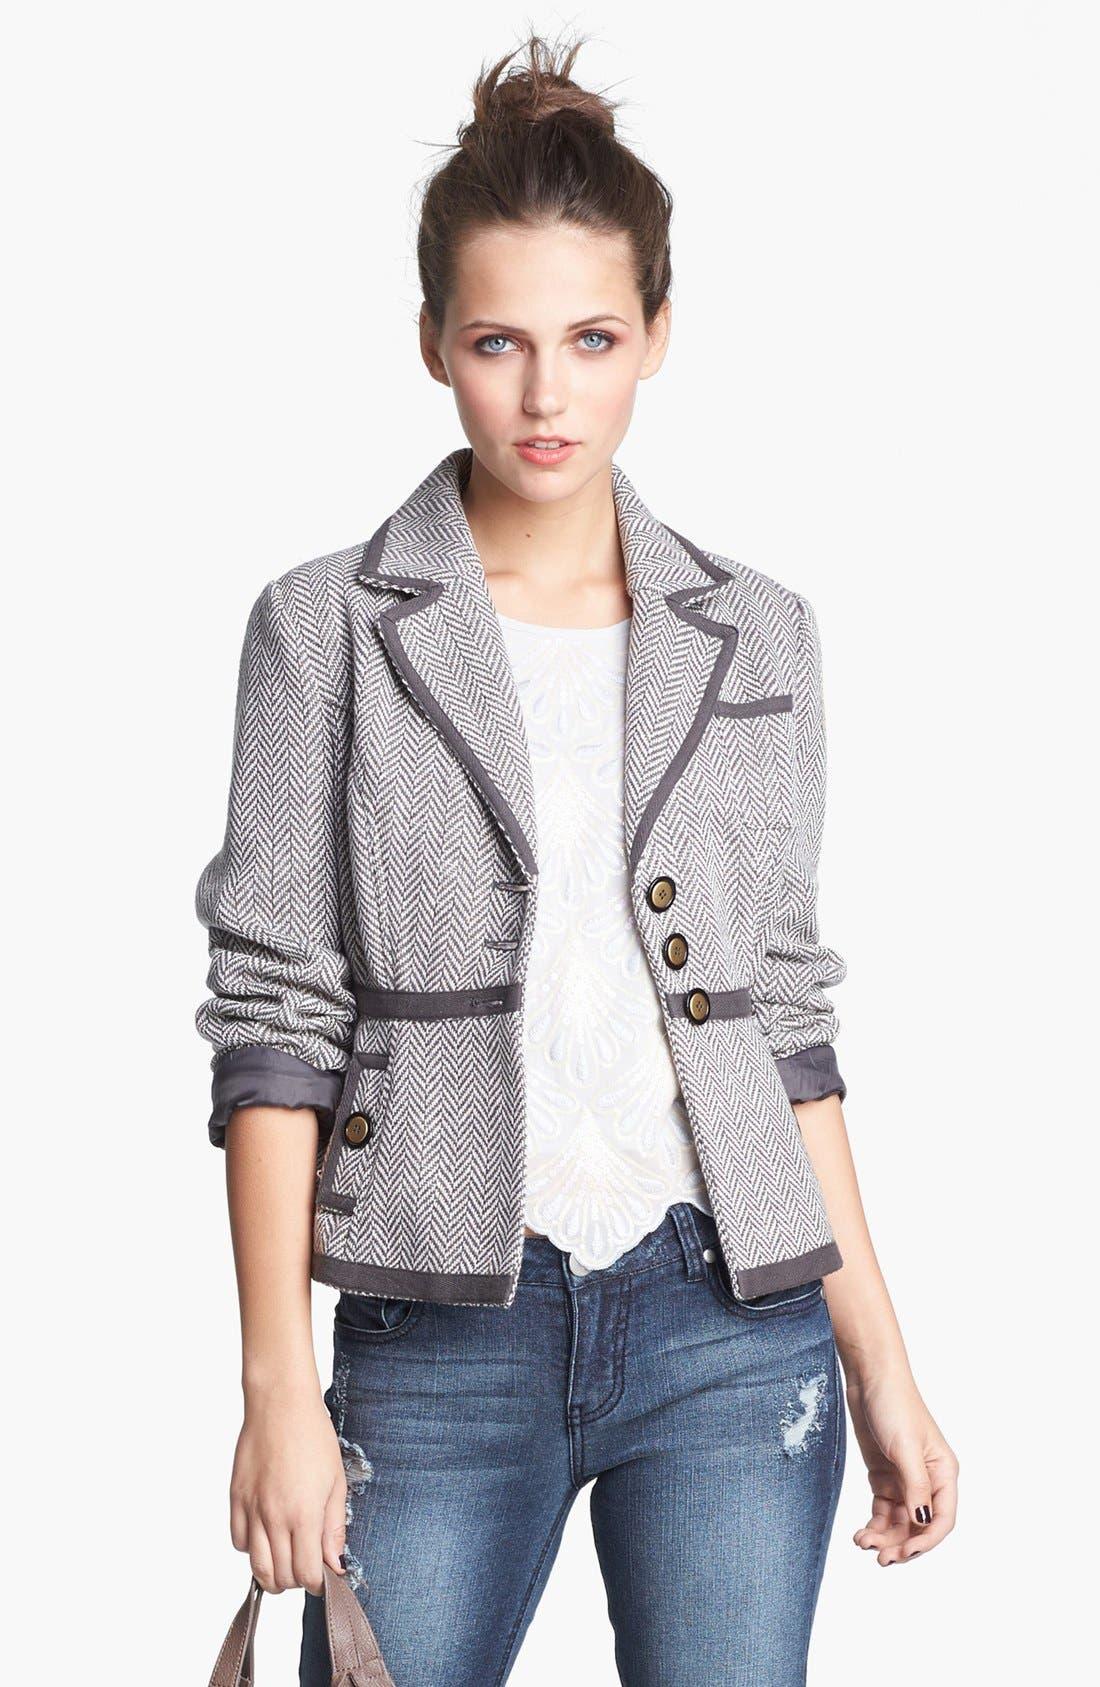 Alternate Image 1 Selected - Tulle Herringbone Contrast Trim Jacket (Juniors) (Online Only)